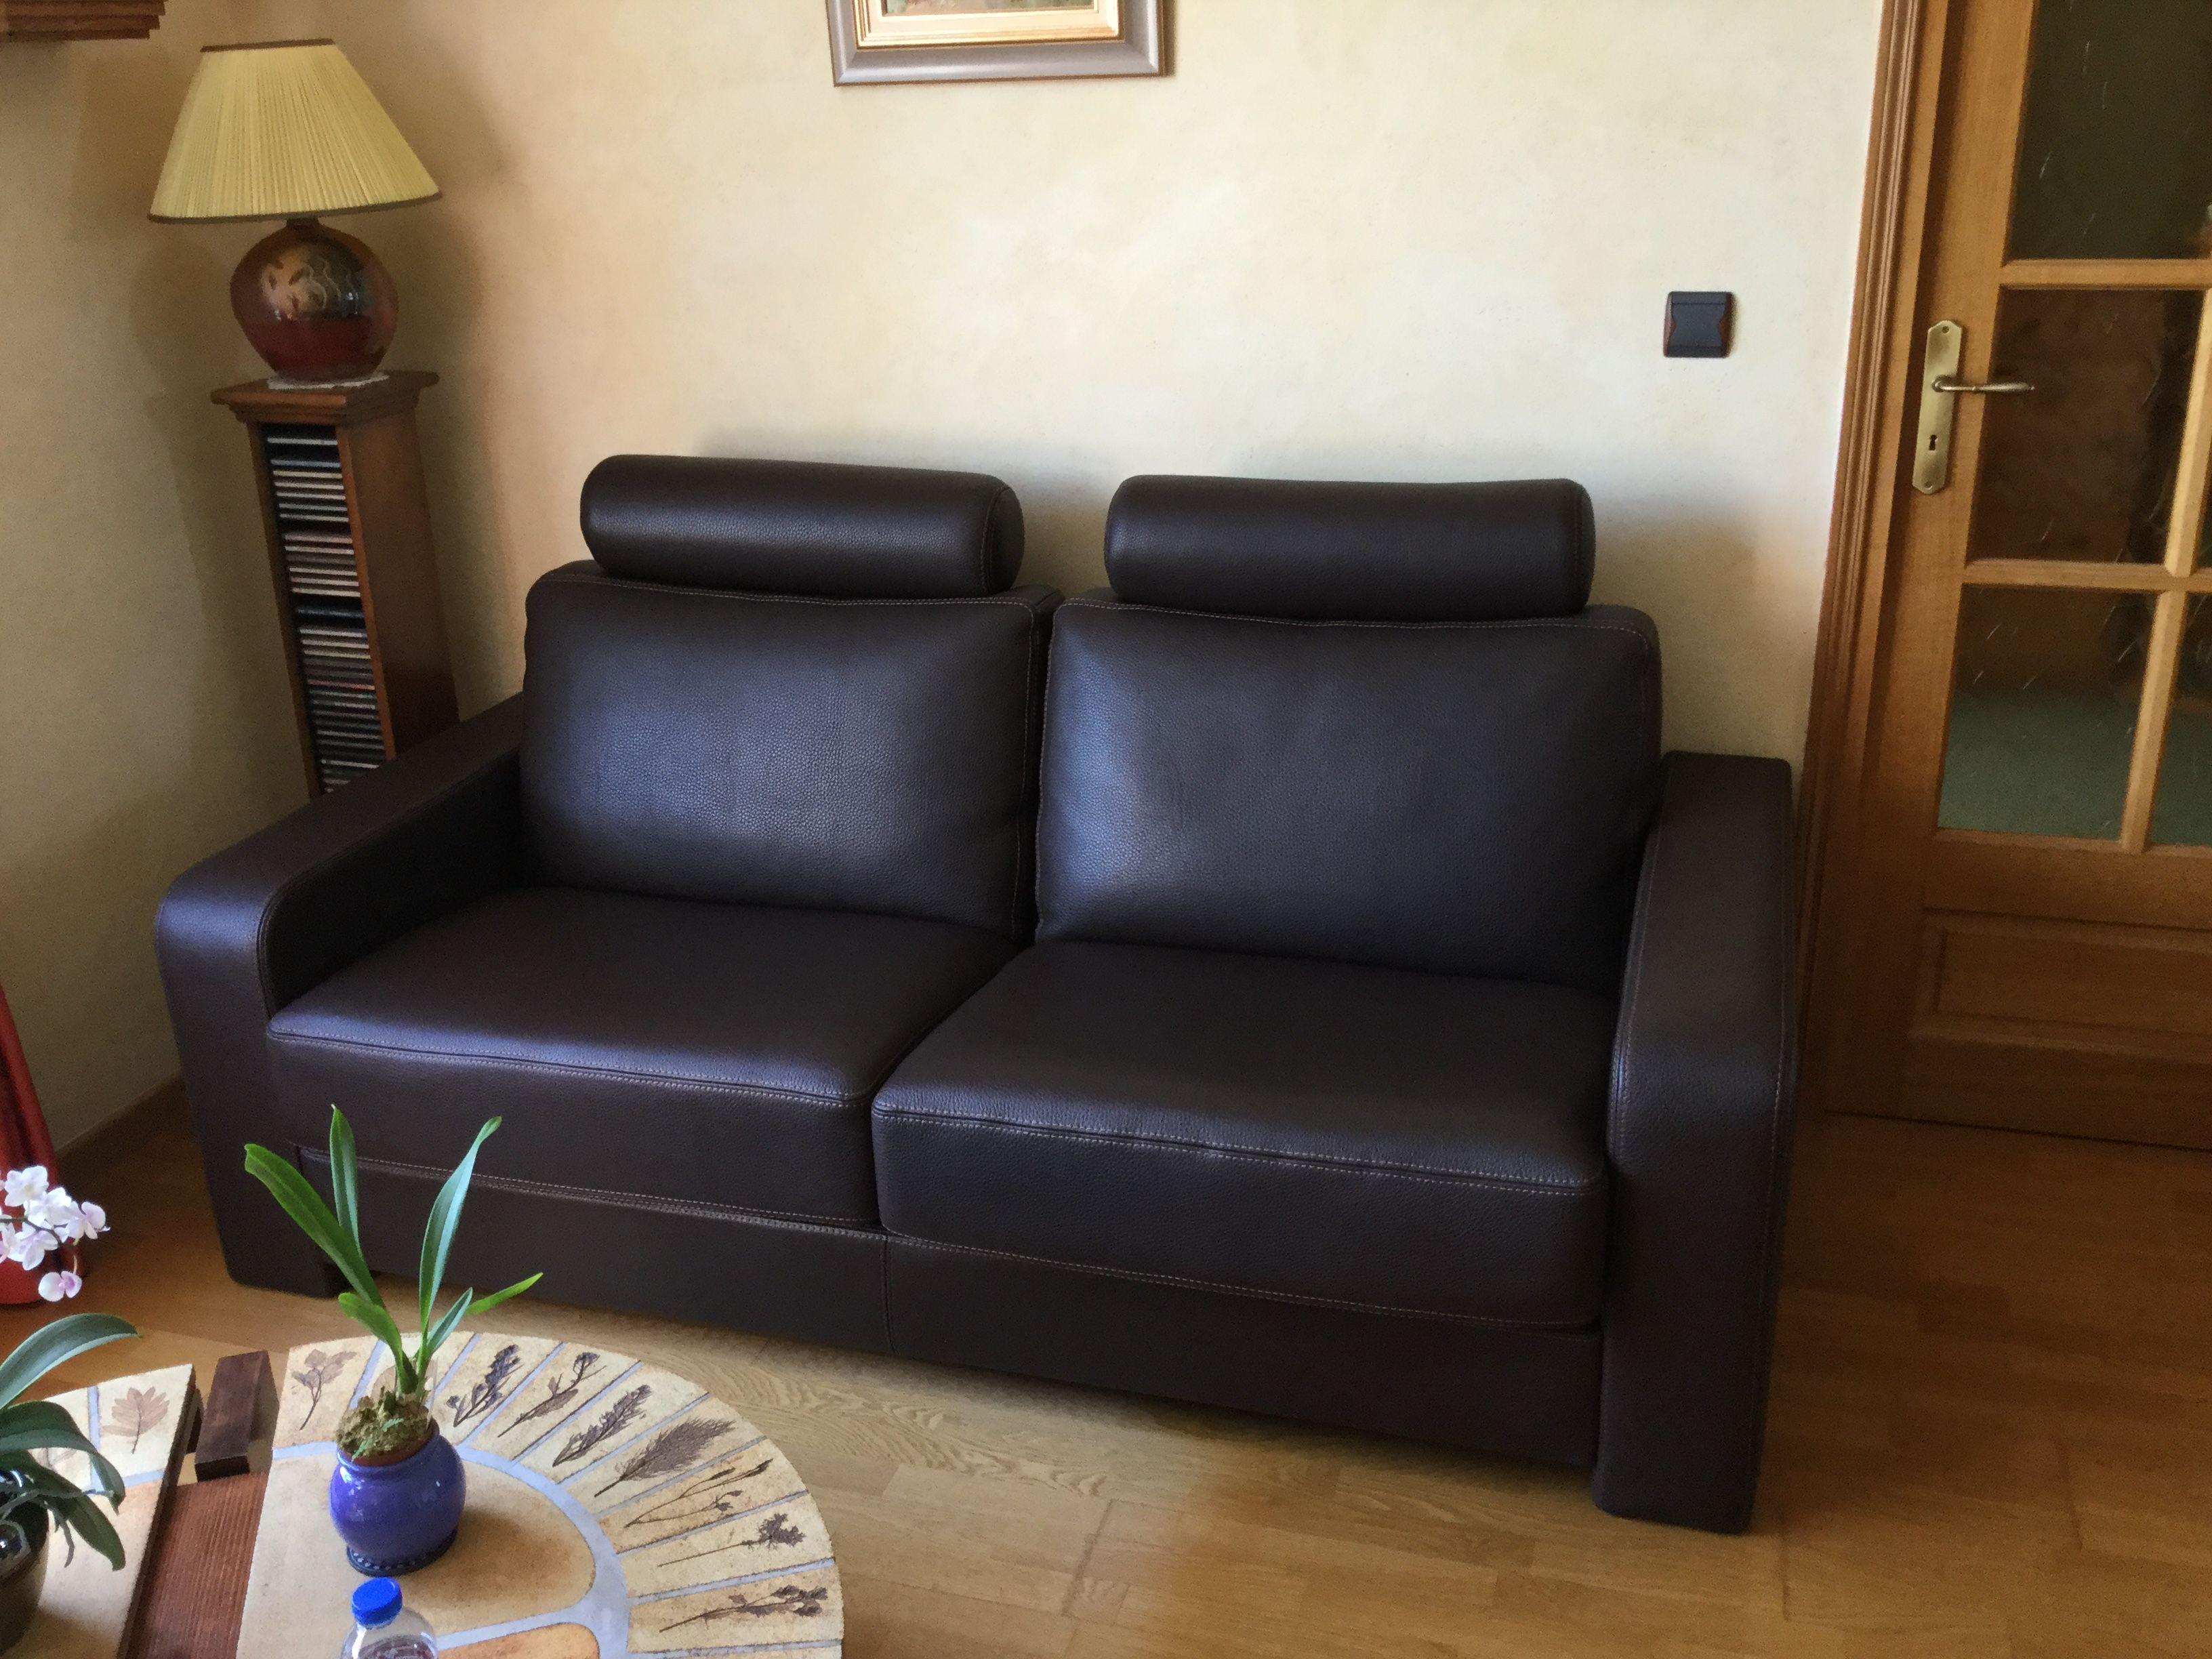 marque jandri canap bora avec accoudoirs arrondis de. Black Bedroom Furniture Sets. Home Design Ideas